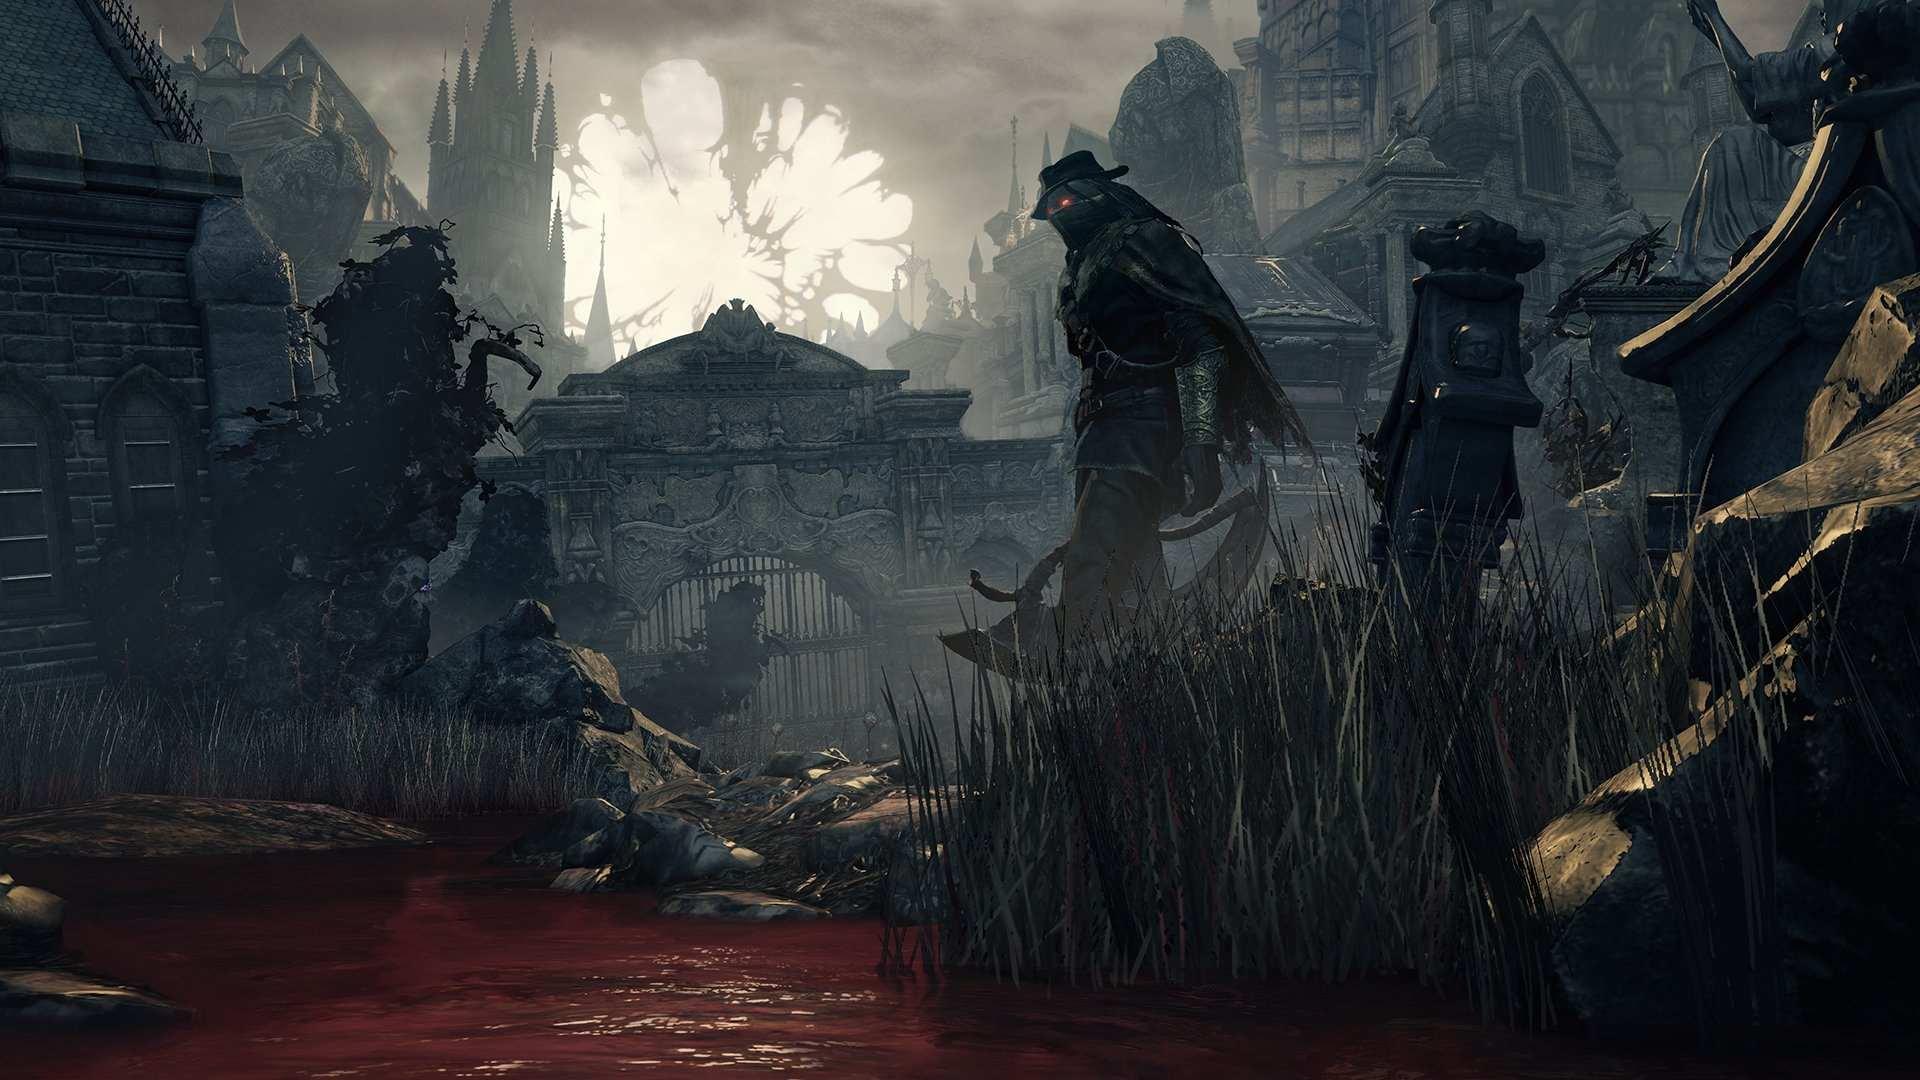 Bloodborne wallpapers wallpaper cave - Bloodborne download ...